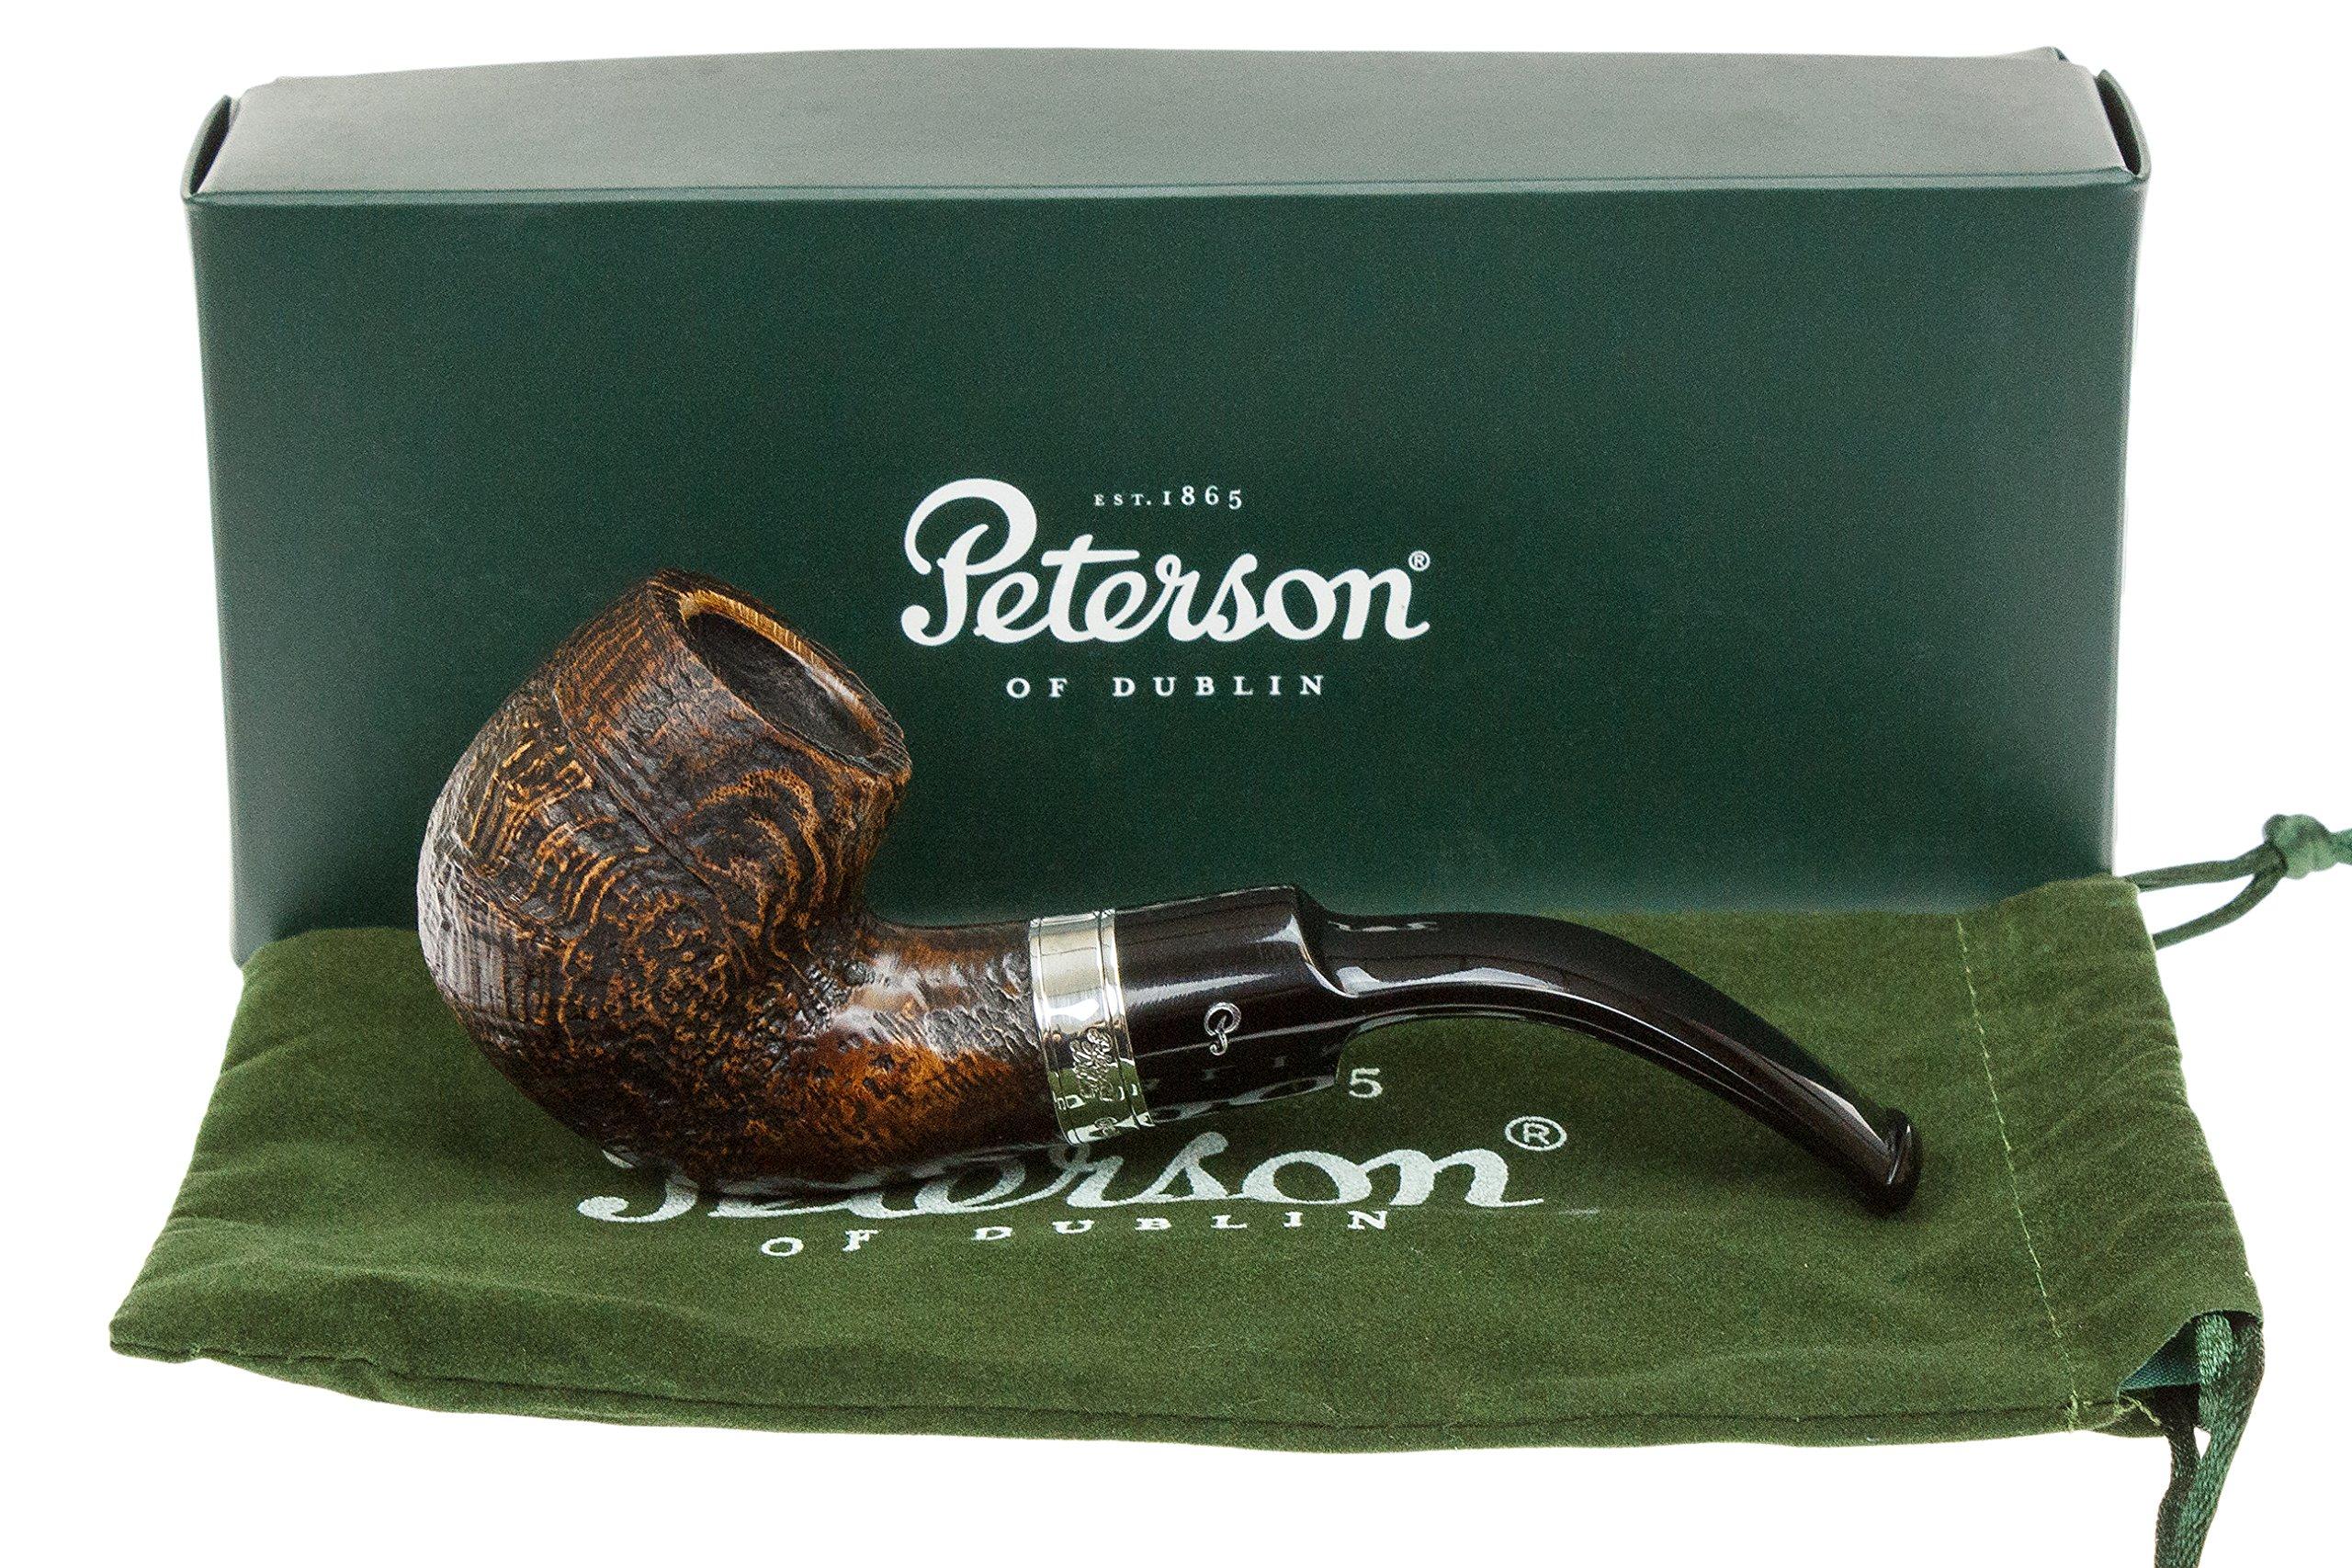 Peterson Dublin Castle 221 Tobacco Pipe by Peterson